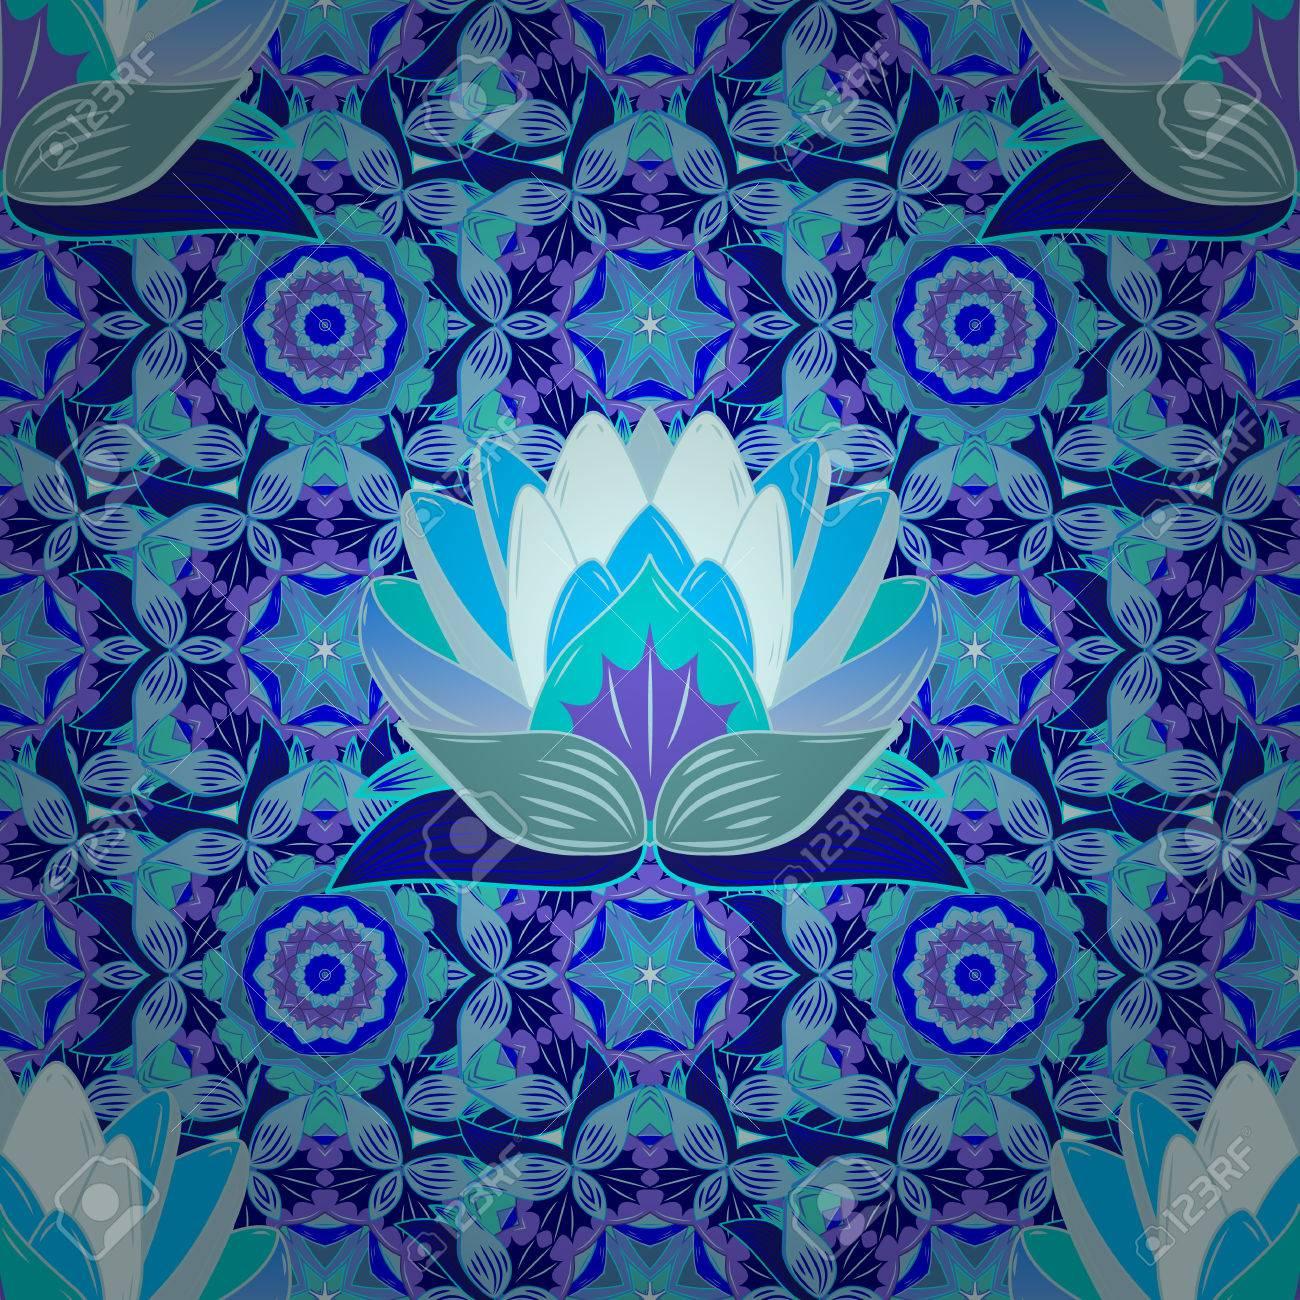 Raster Seamless Continuous Wallpaper Tile Lotus Flower Design